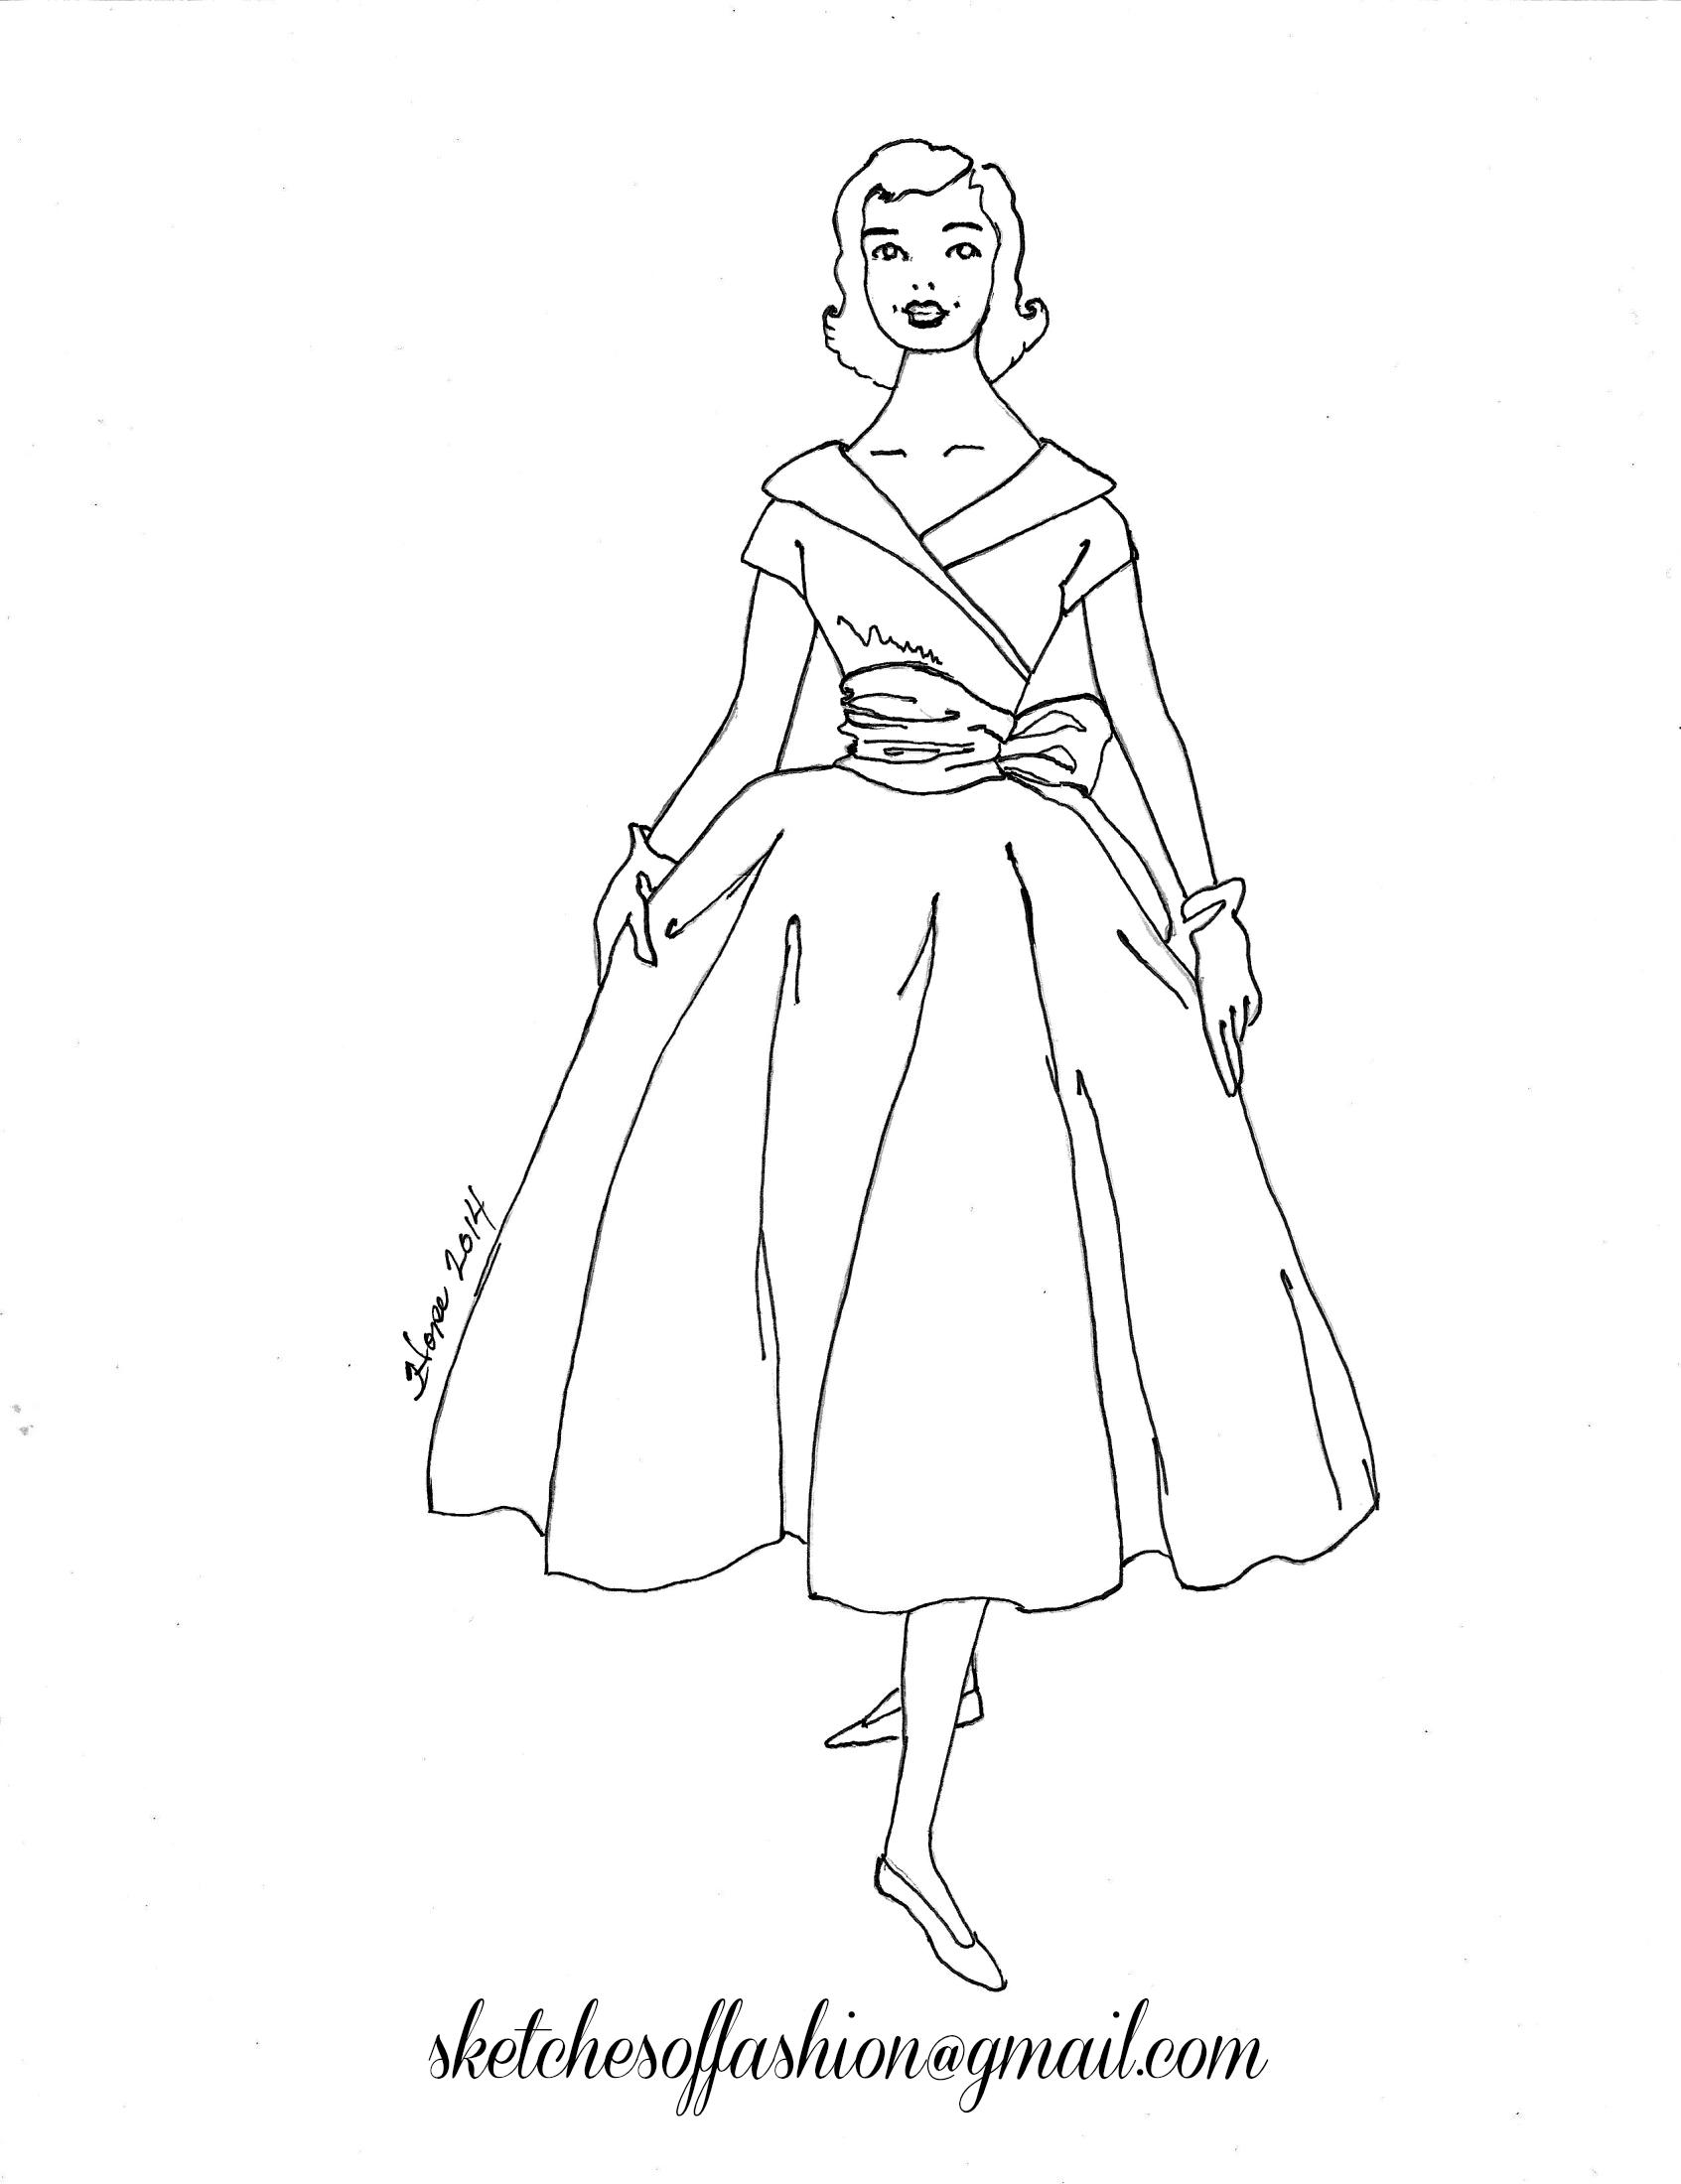 1693x2200 Fashion Design A Fashion Sketch Colouring Pages,fashion Design